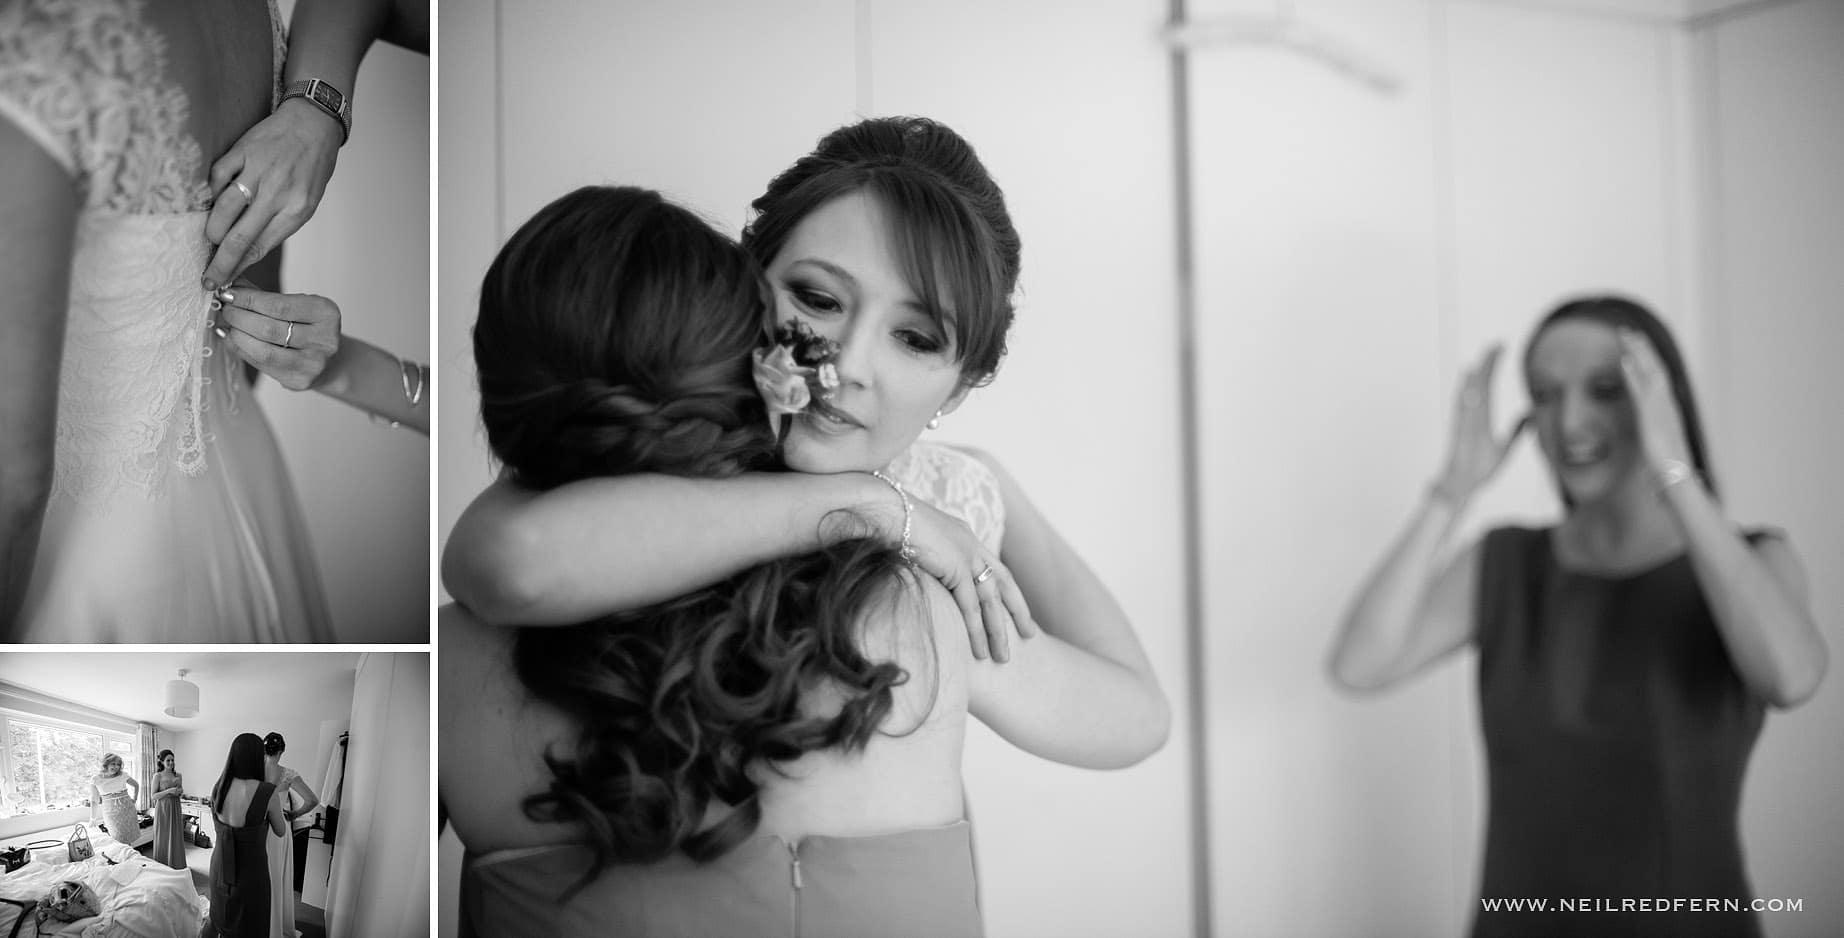 Wedding getting ready photographs 15